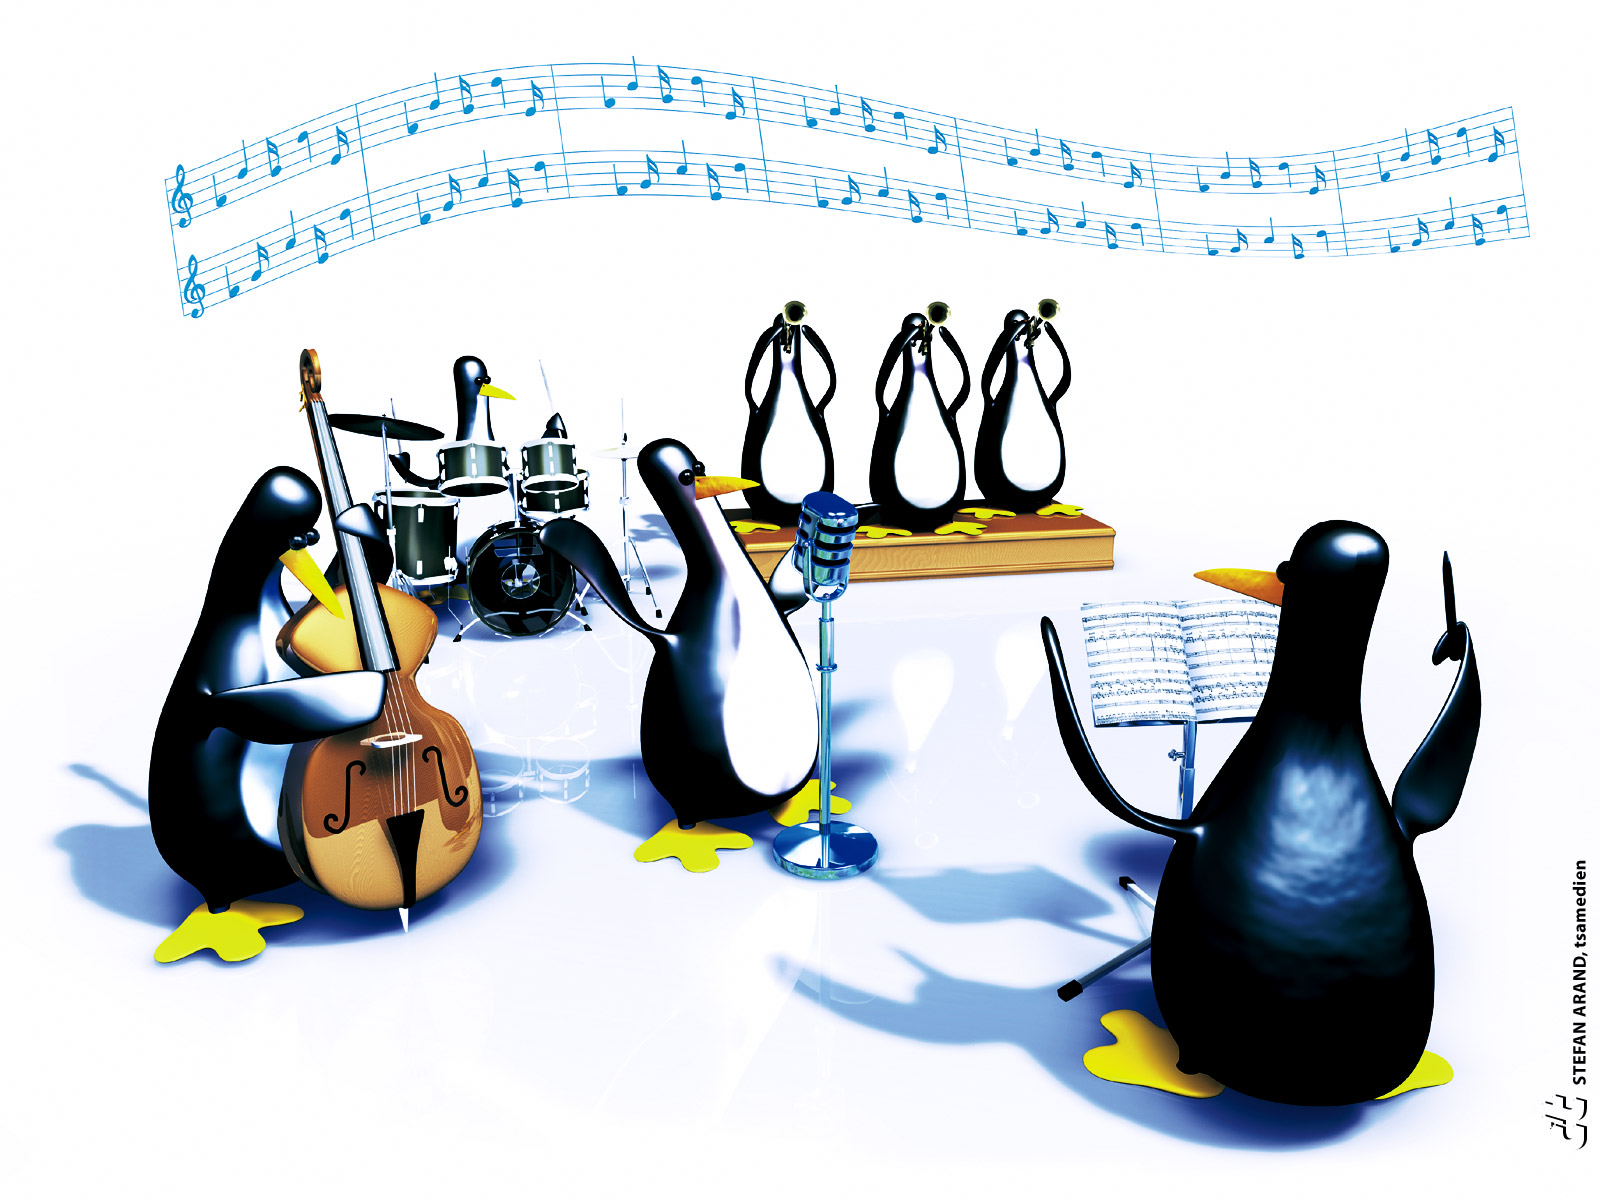 editar musica mp3: